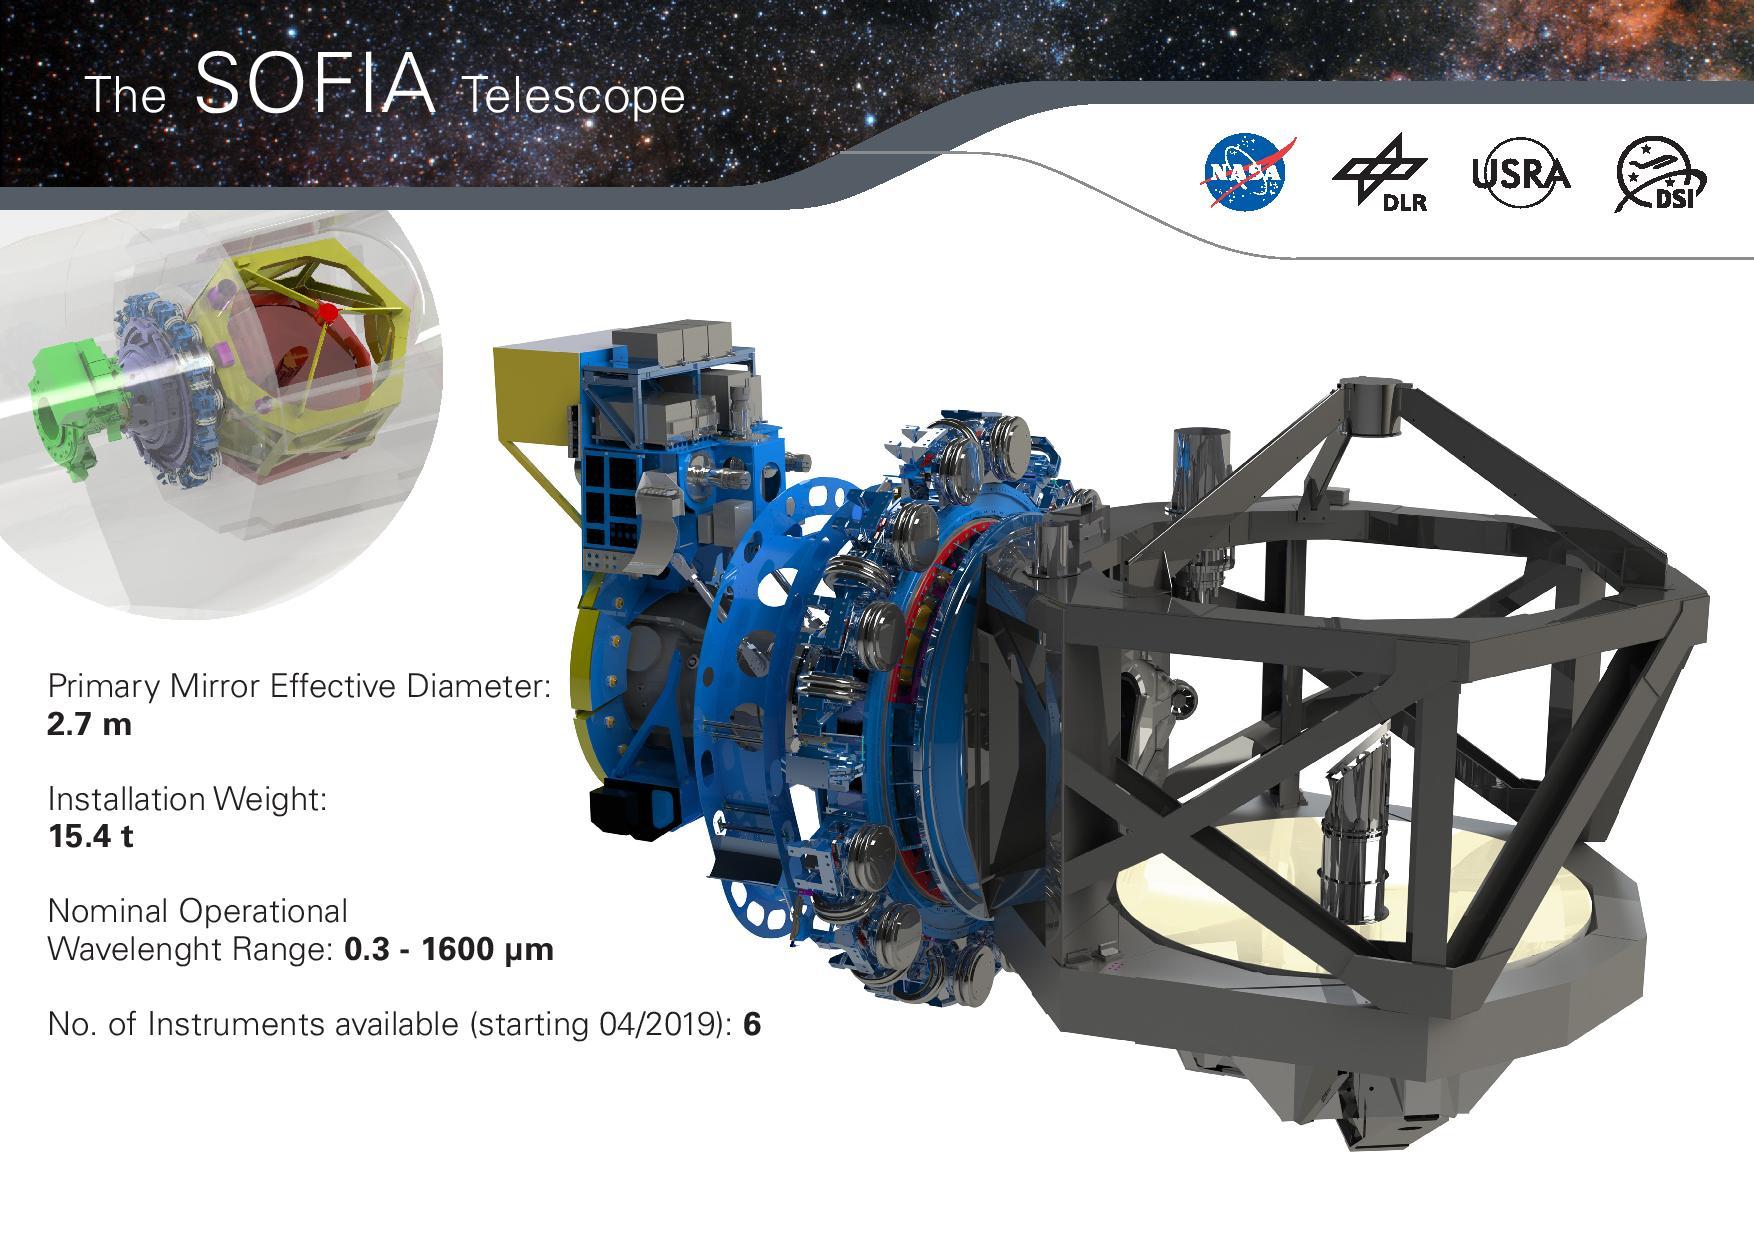 https://opencms.uni-stuttgart.de/project/dsi/img/infomaterial/a4_infoblaetter_2019/Teleskop-page-001.jpg